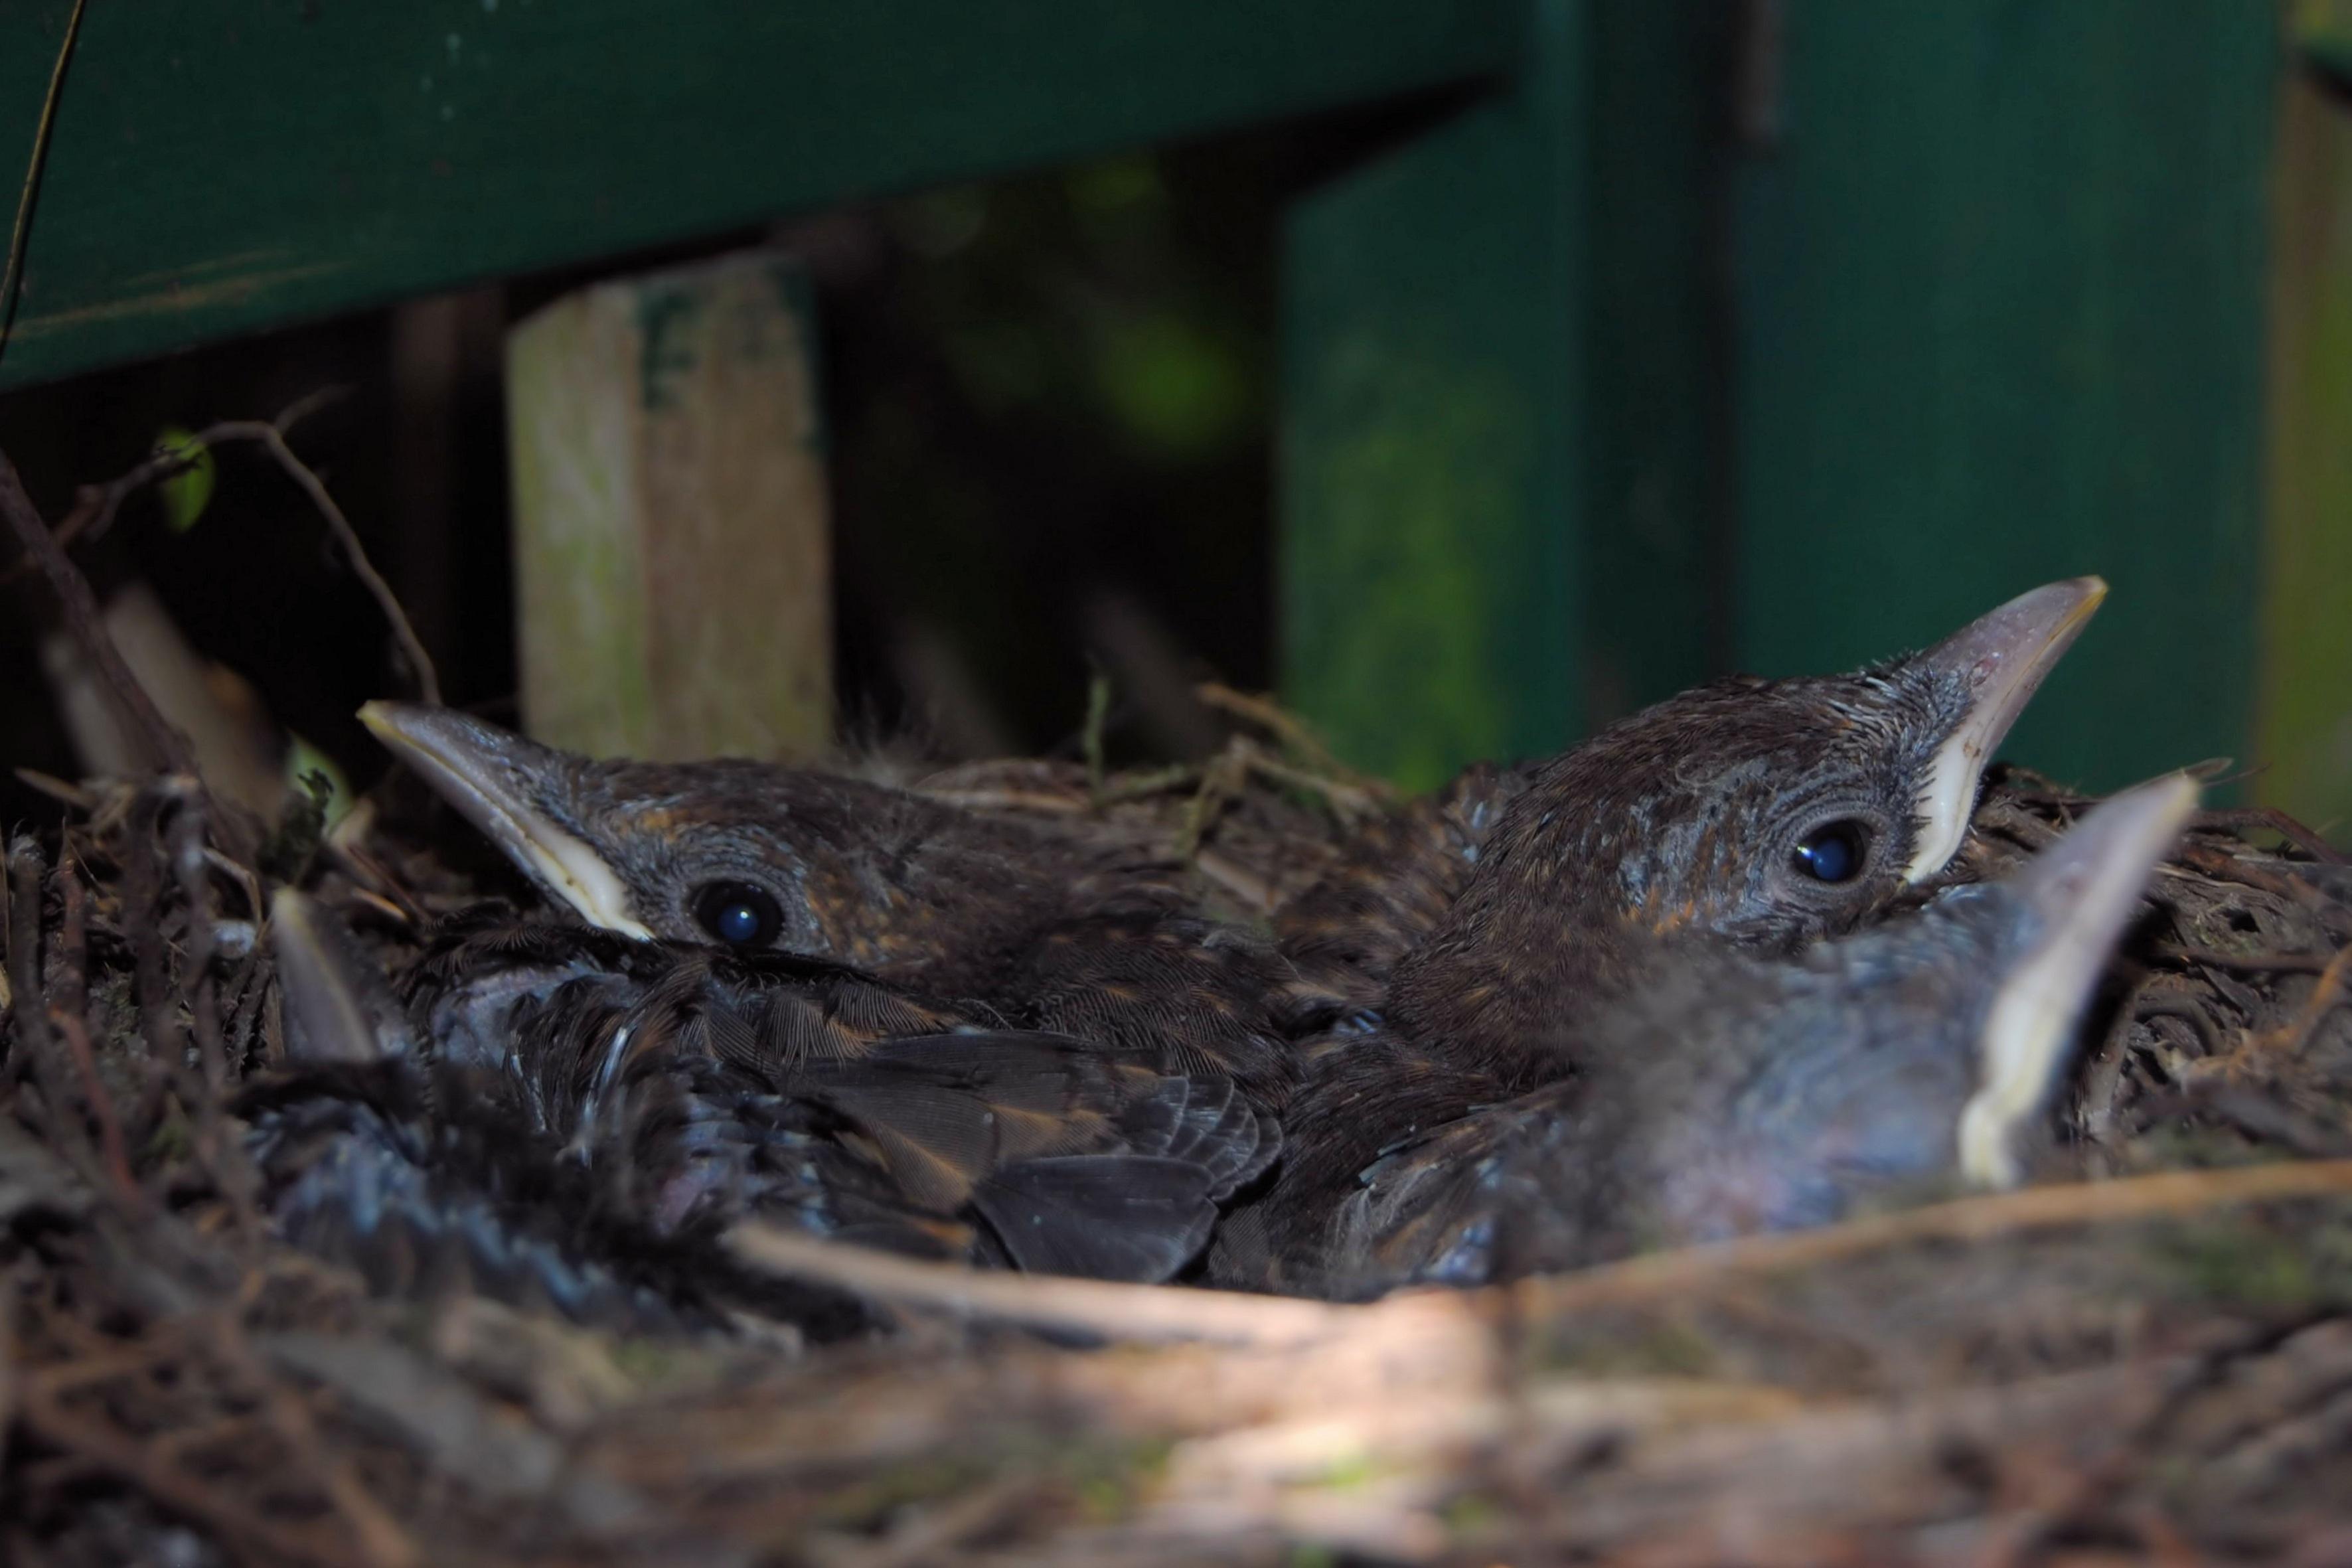 mladí ptáci com